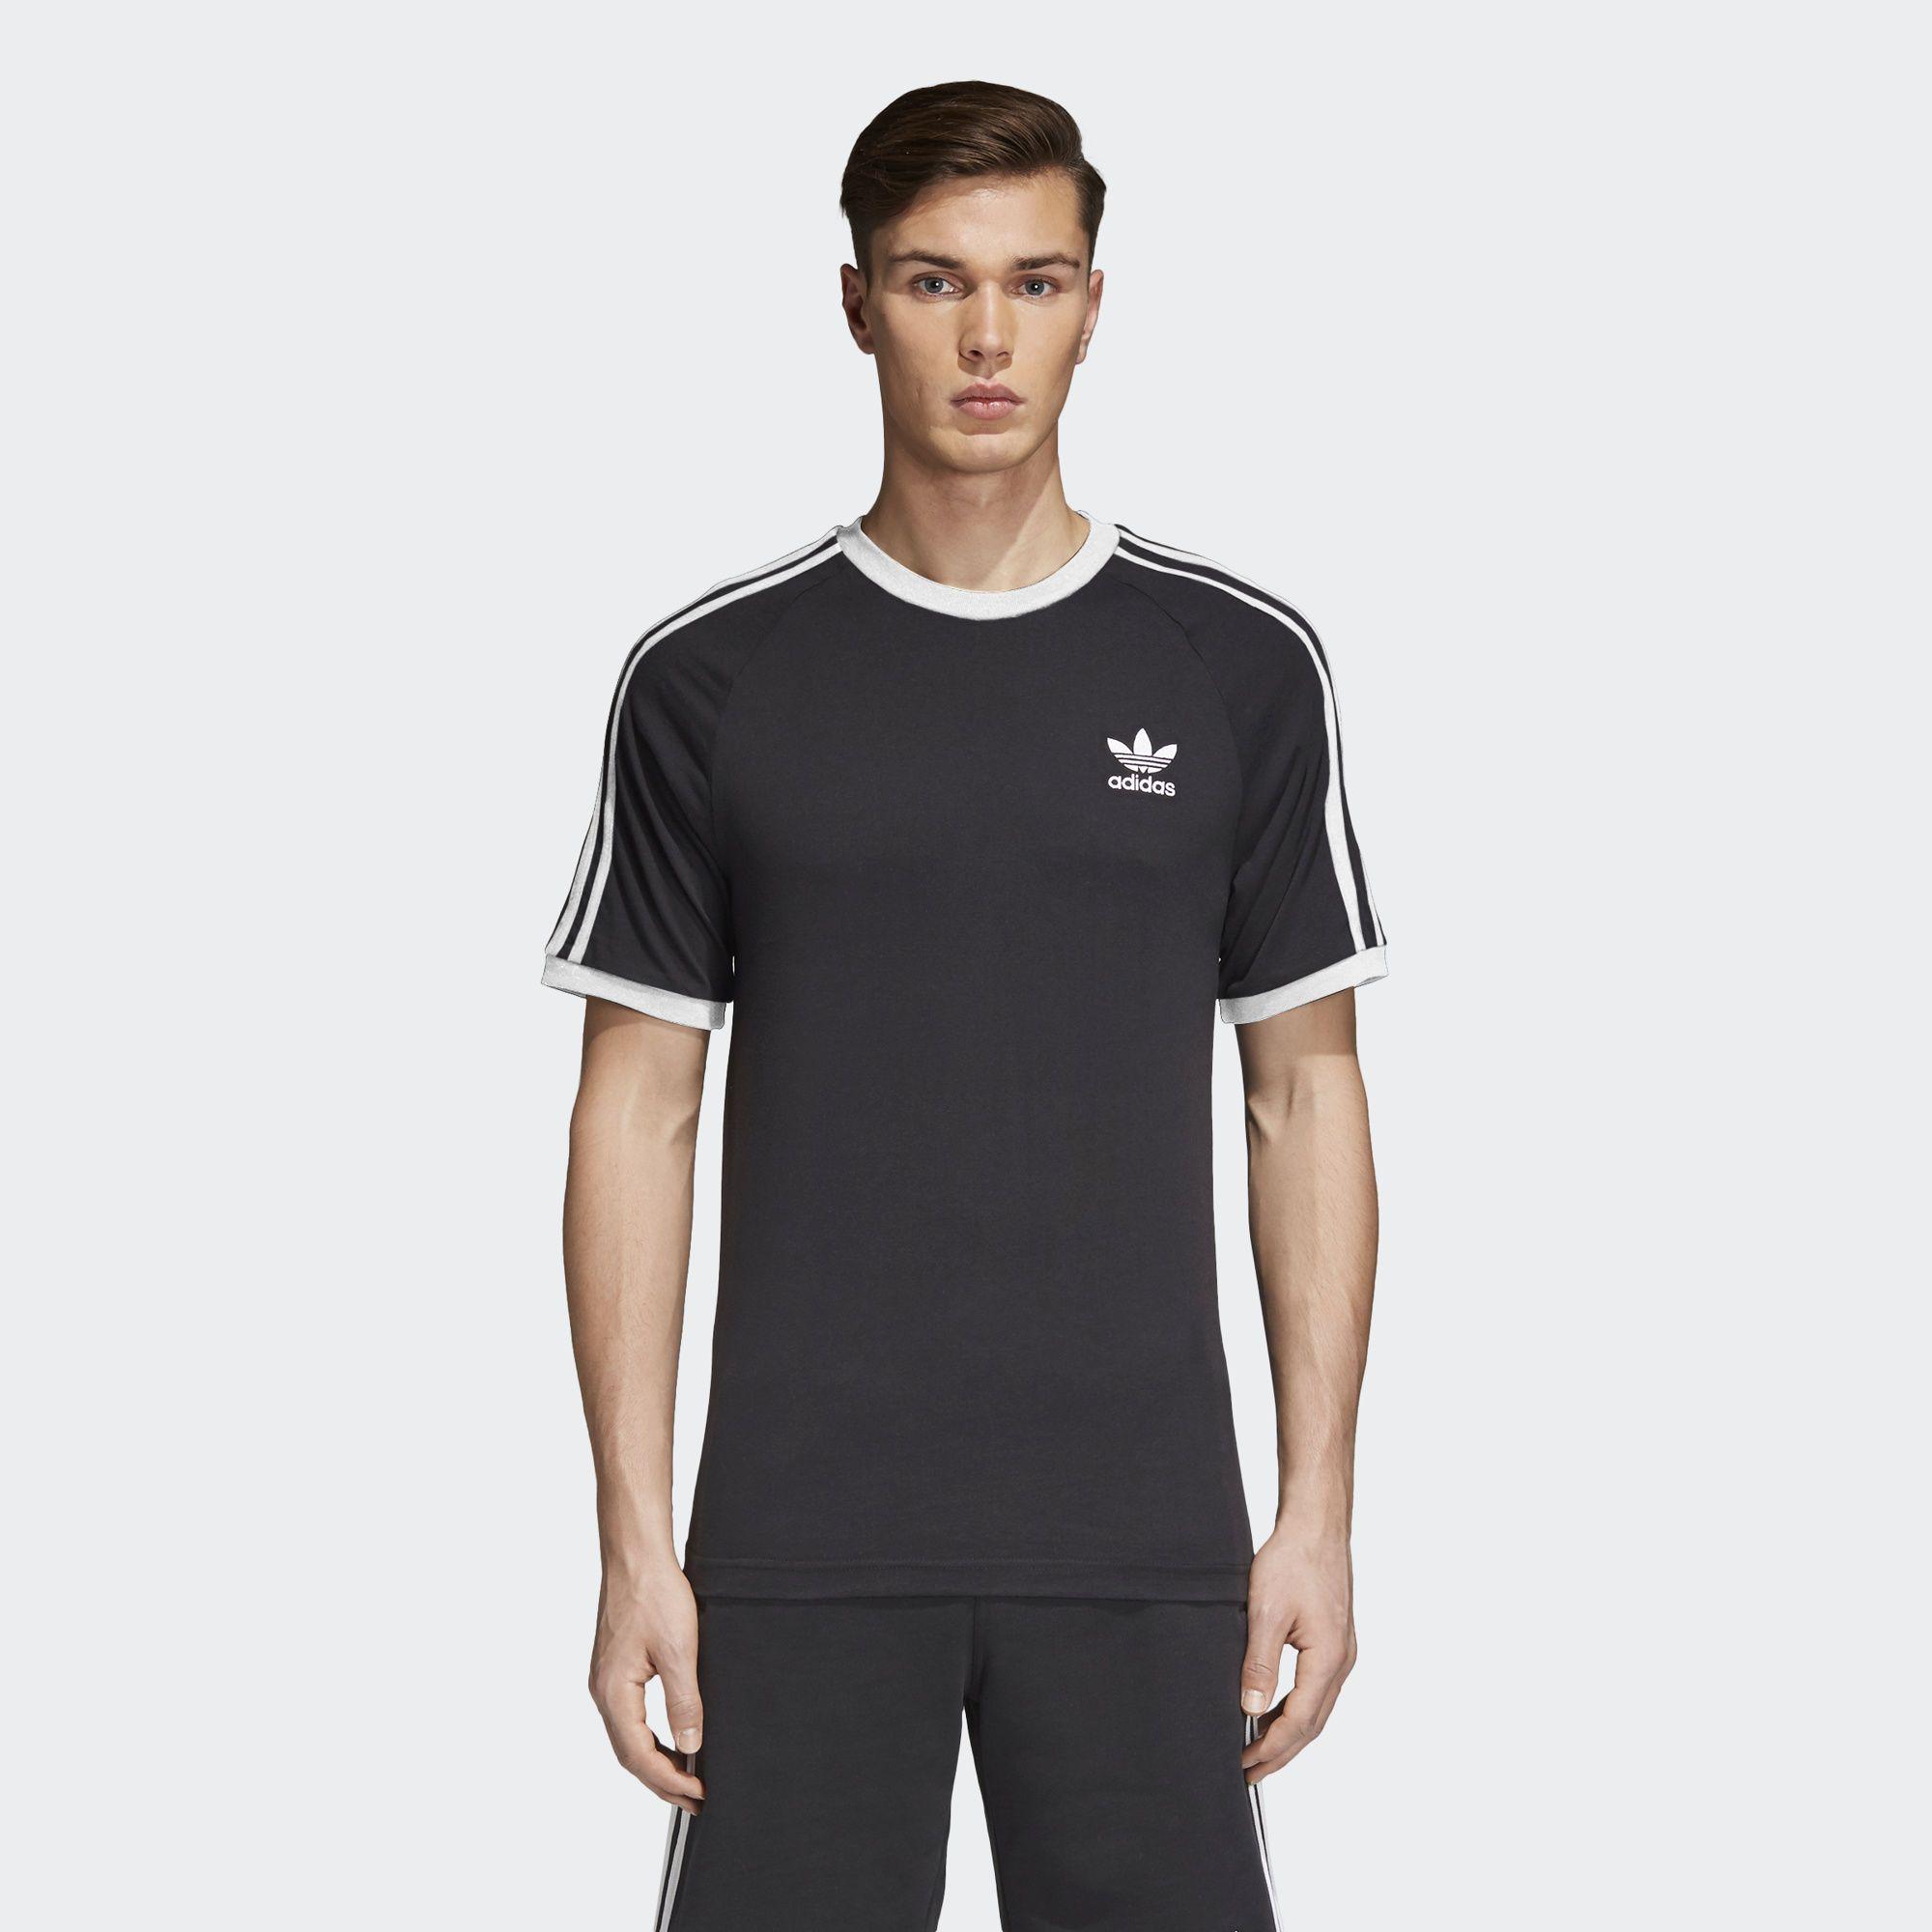 Adidas California Tee Black 3 Stripes CLFN AZ8127